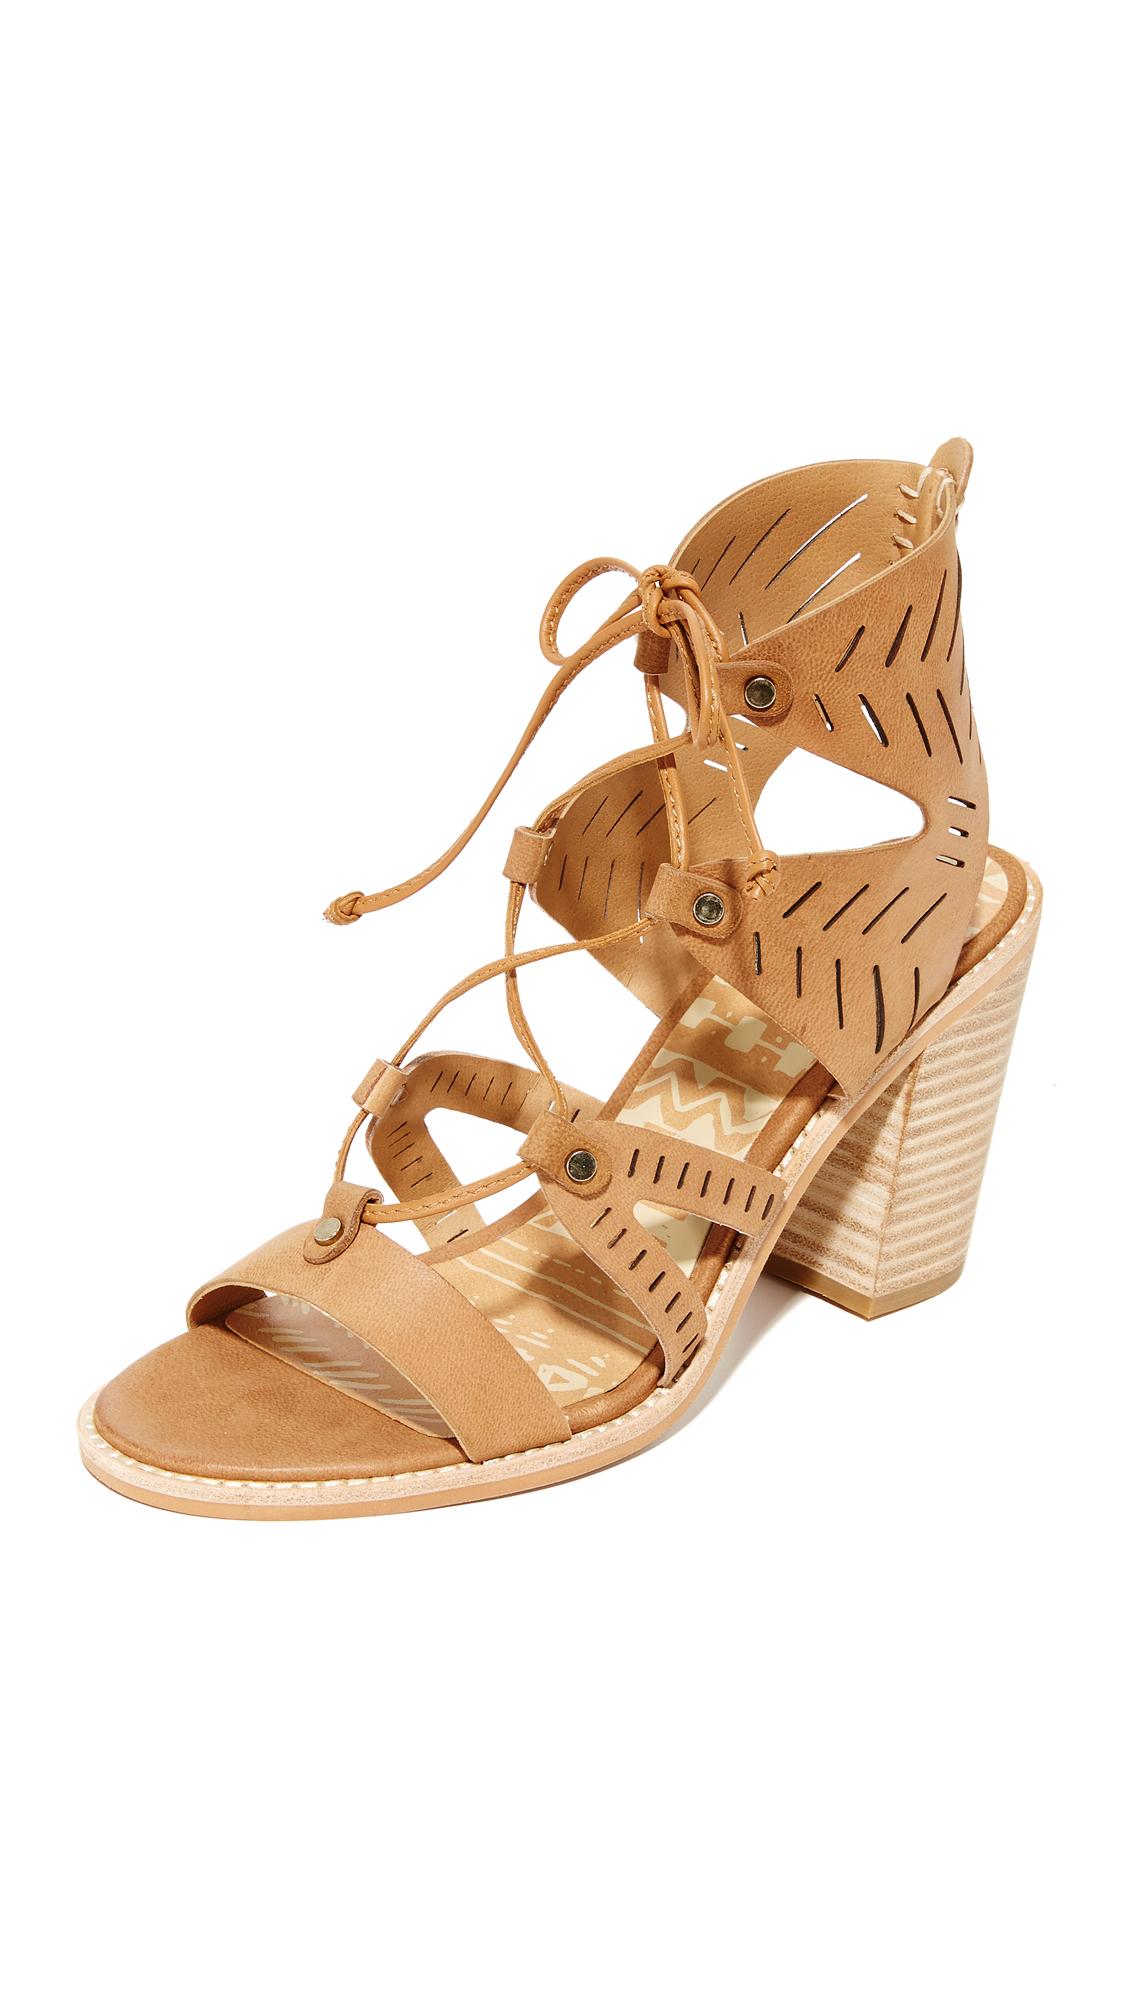 Dolce Vita Luci Sandals - Saddle at Shopbop